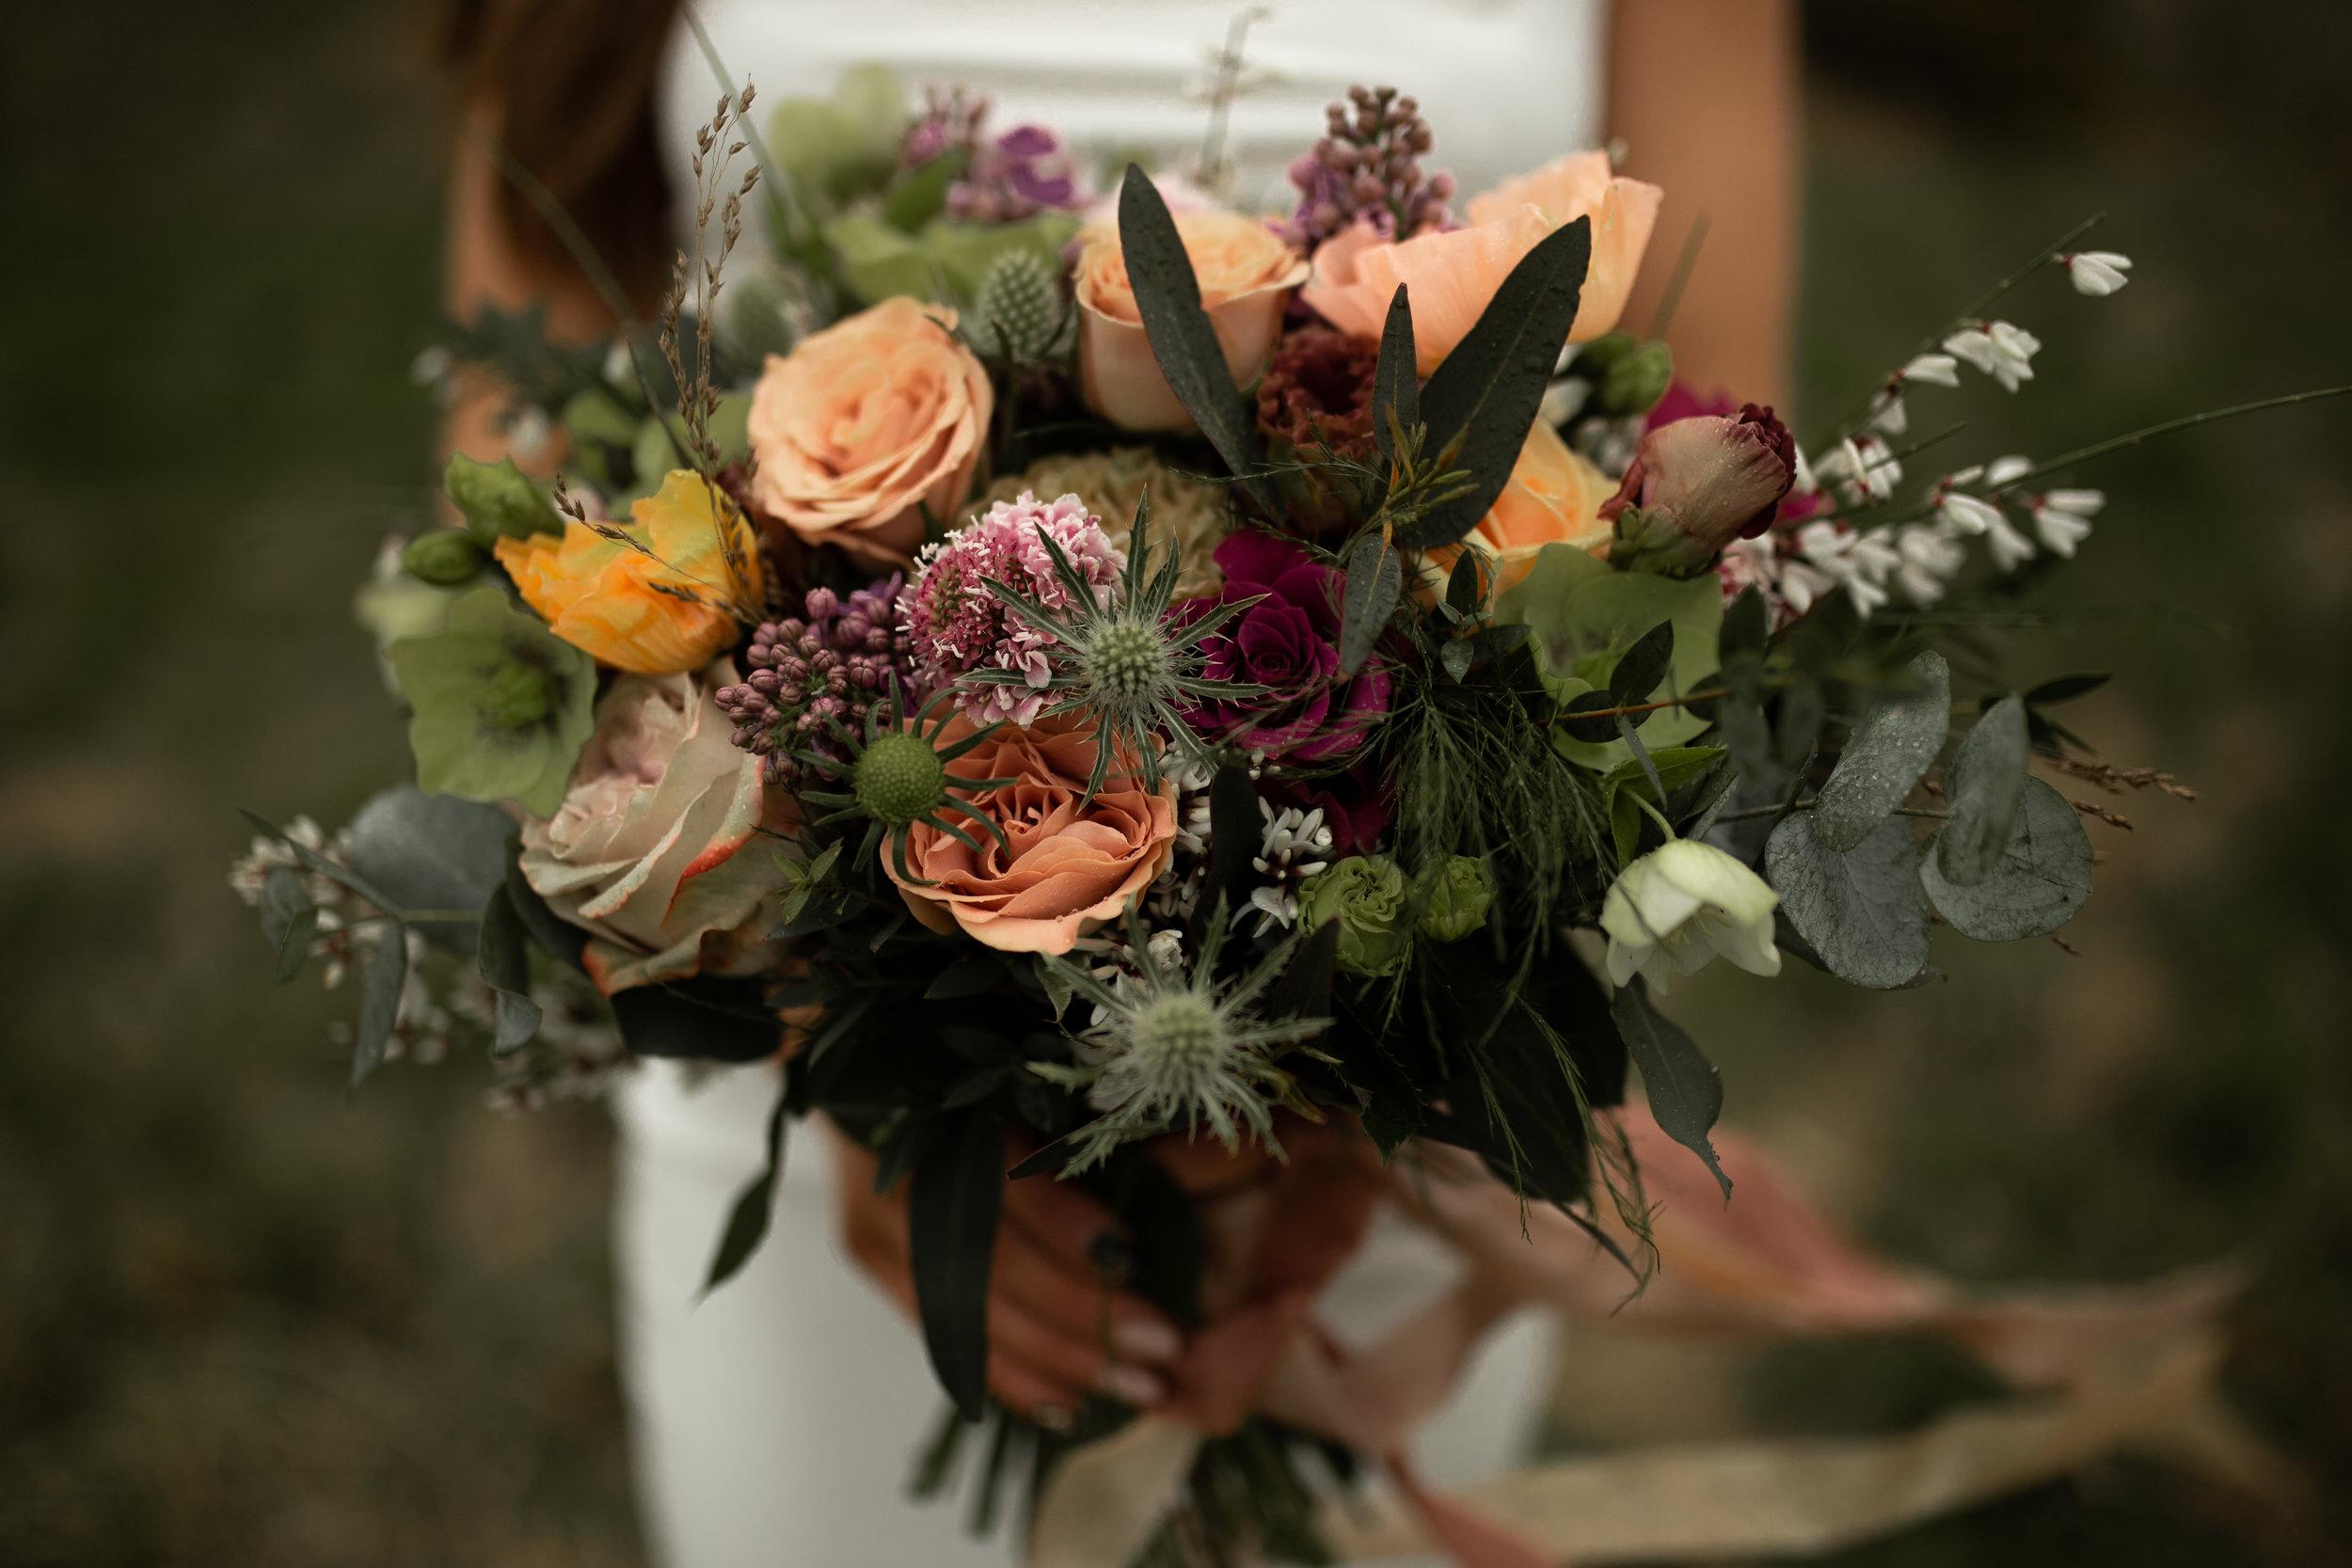 Paula_Russell_Photography_Edinburgh_Wedding_BBonnie_Flowers_6